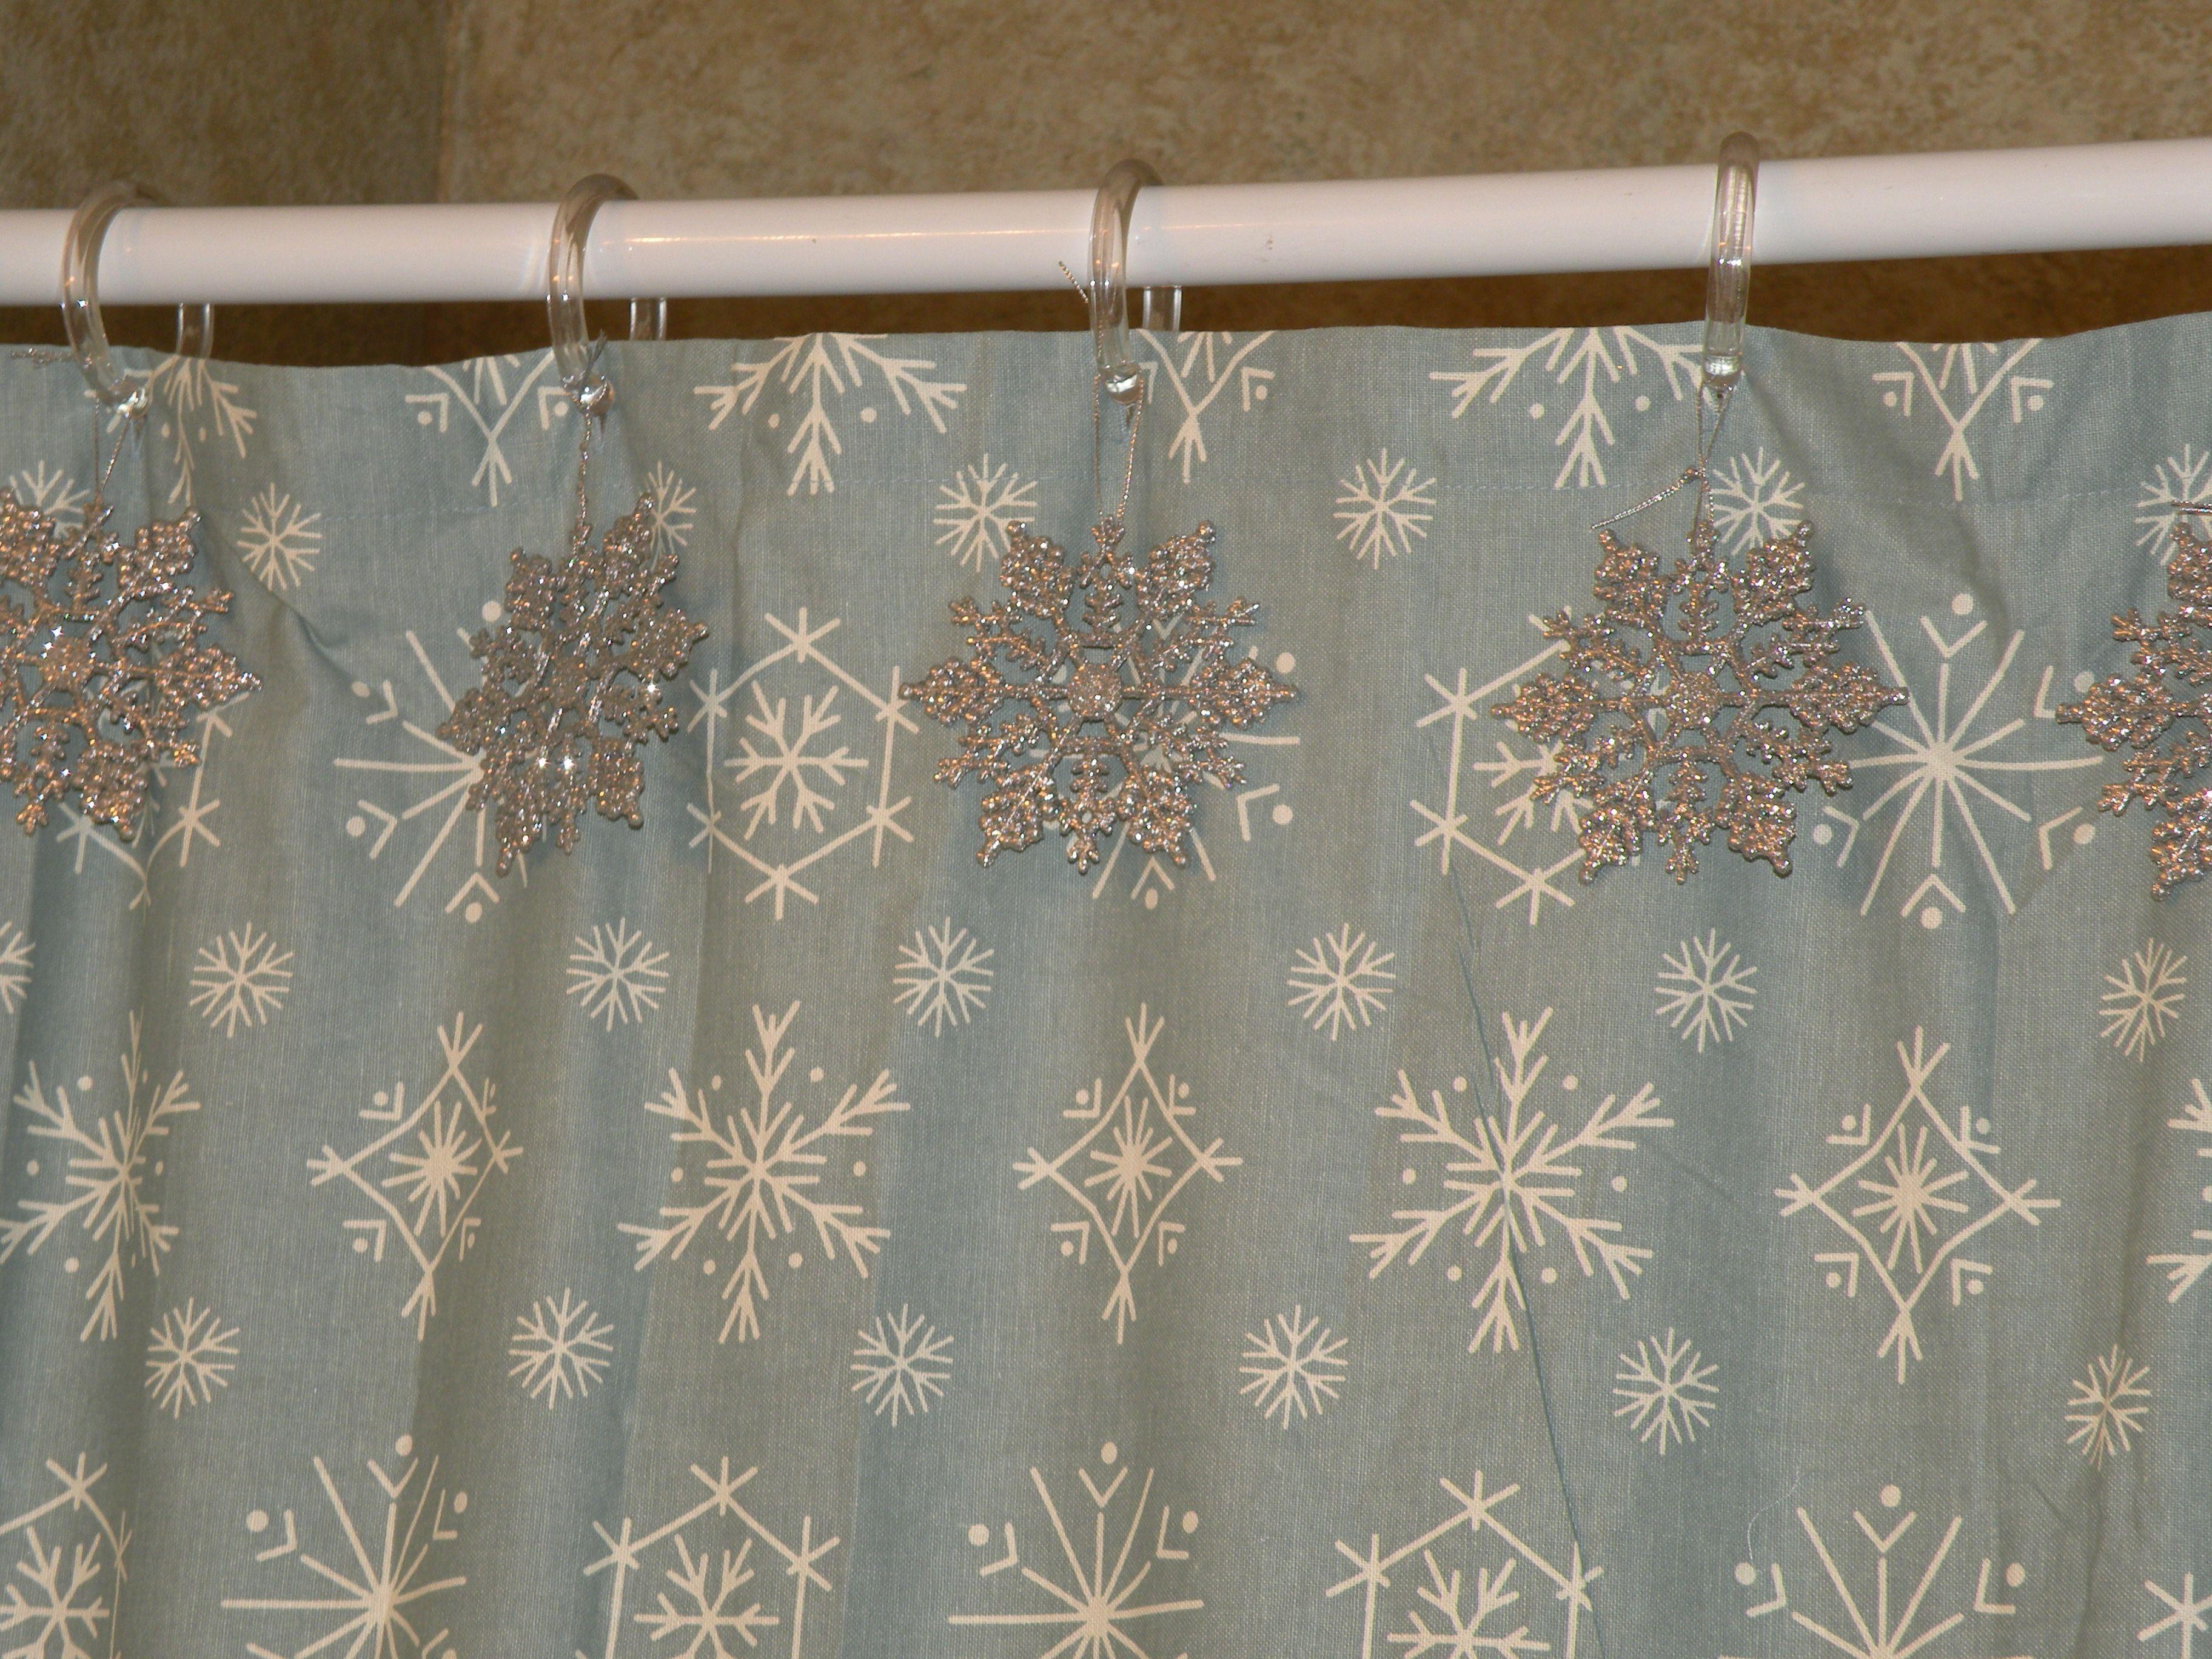 Hang Snowflake Ornaments On Shower Curtain Christmas Bathroom